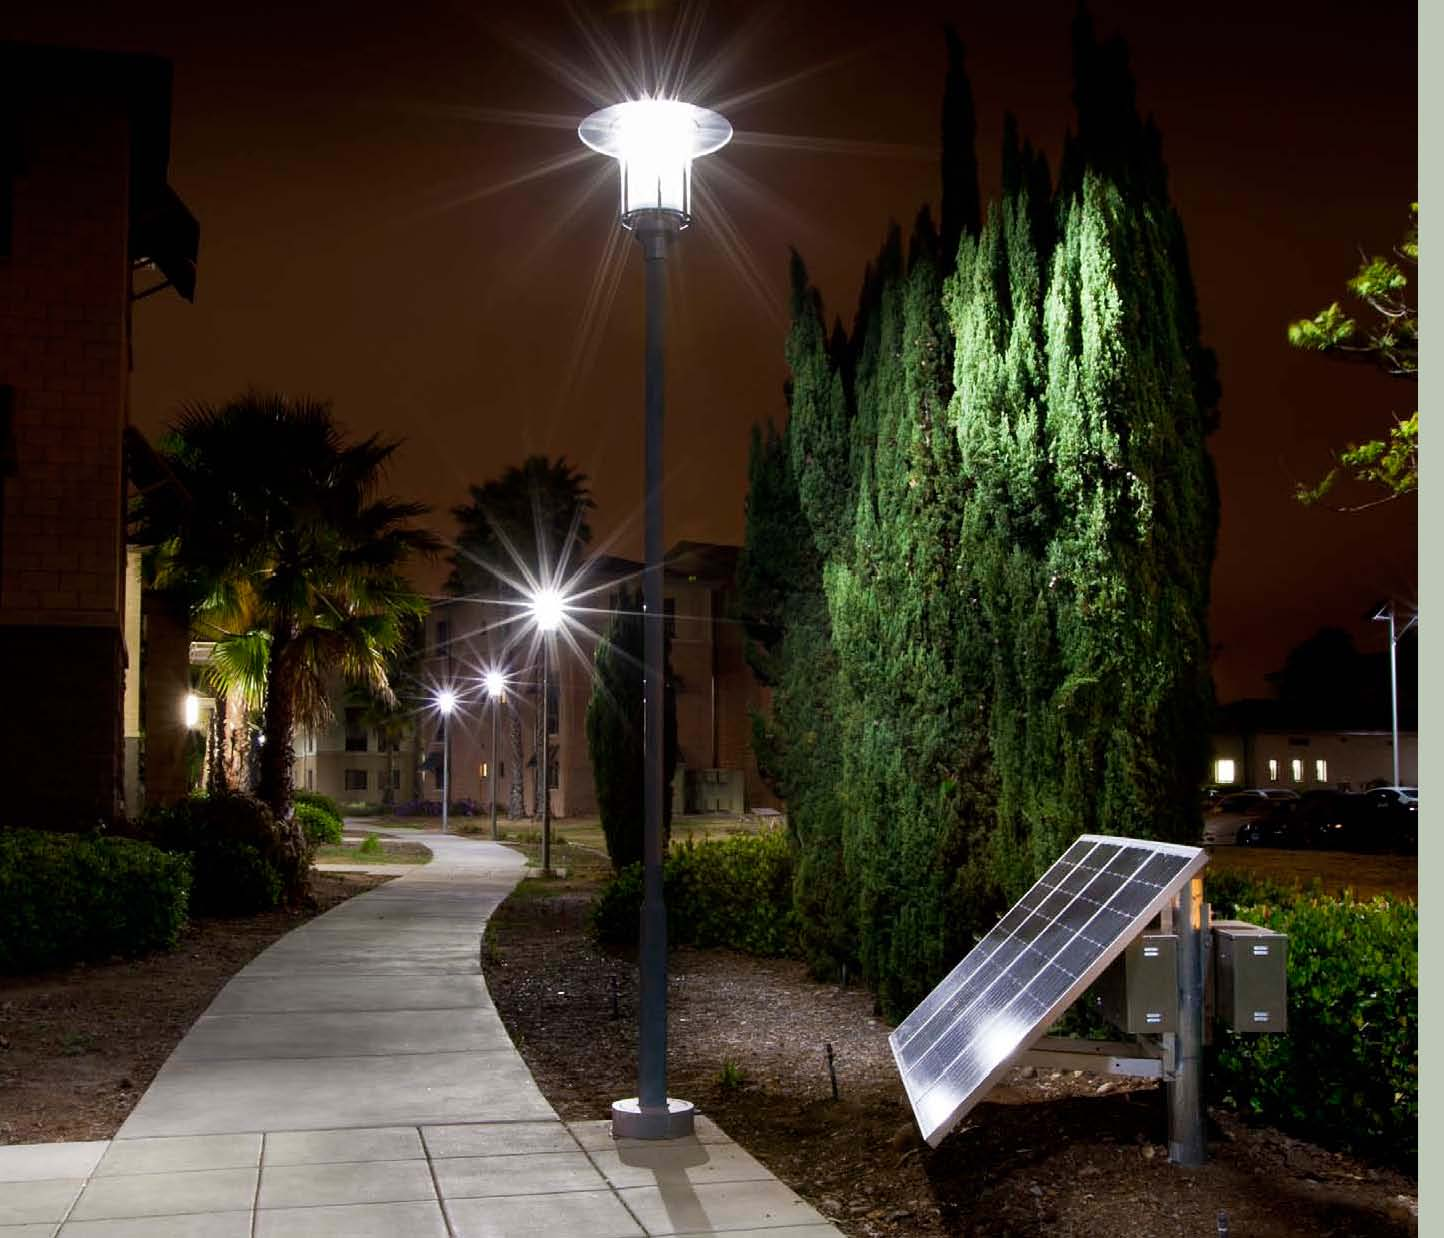 Solar unit operates 4 Slide fixtures on long walkway sm